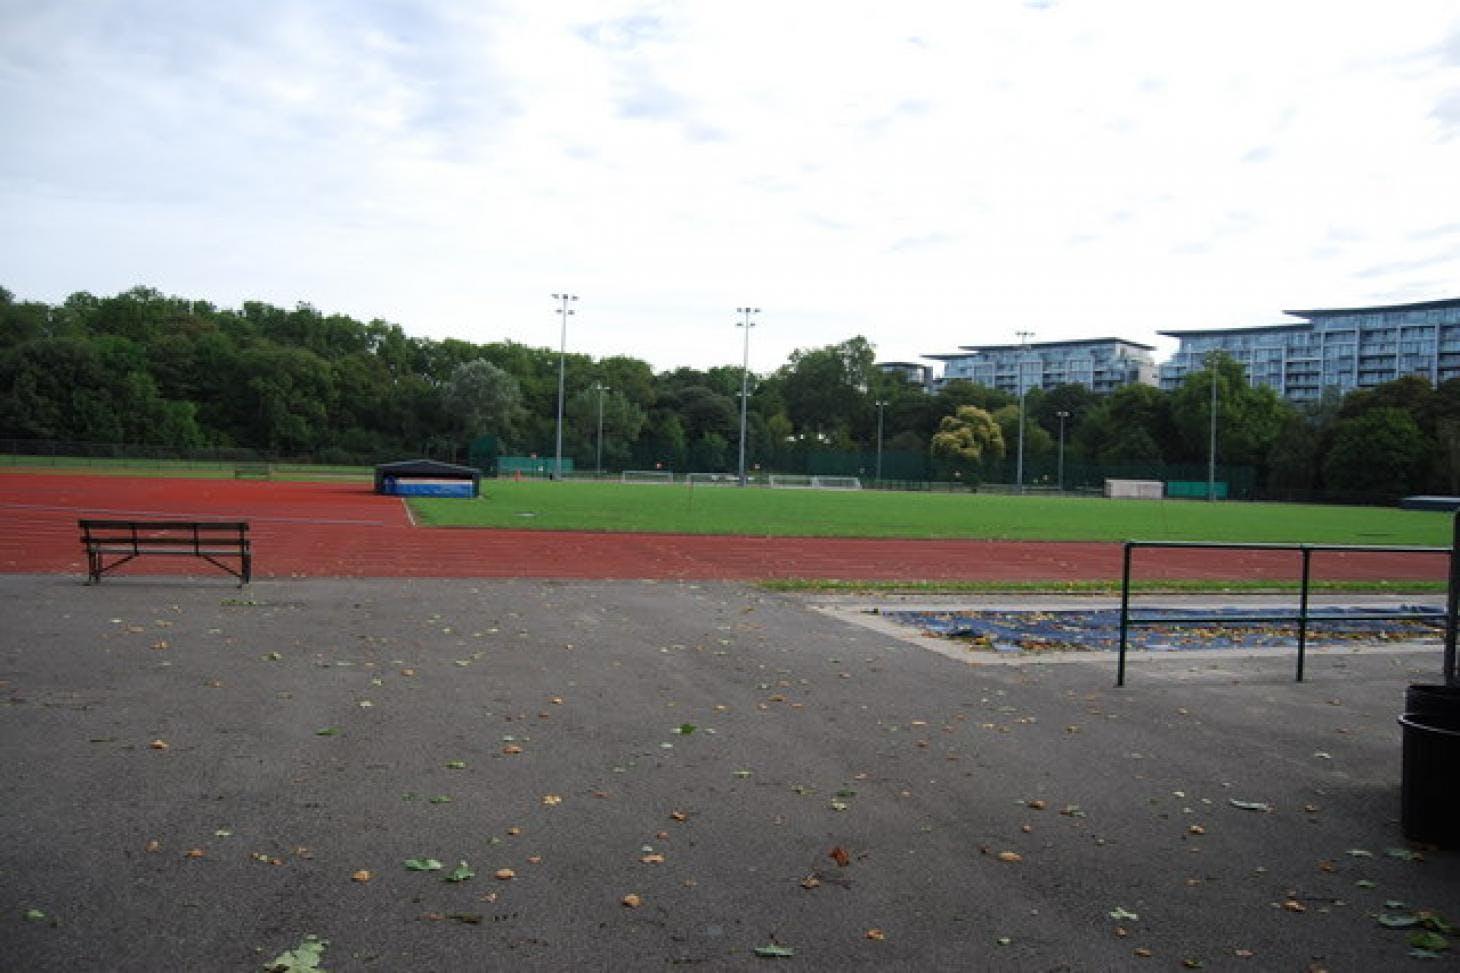 Battersea Park Millennium Arena Union rugby pitch